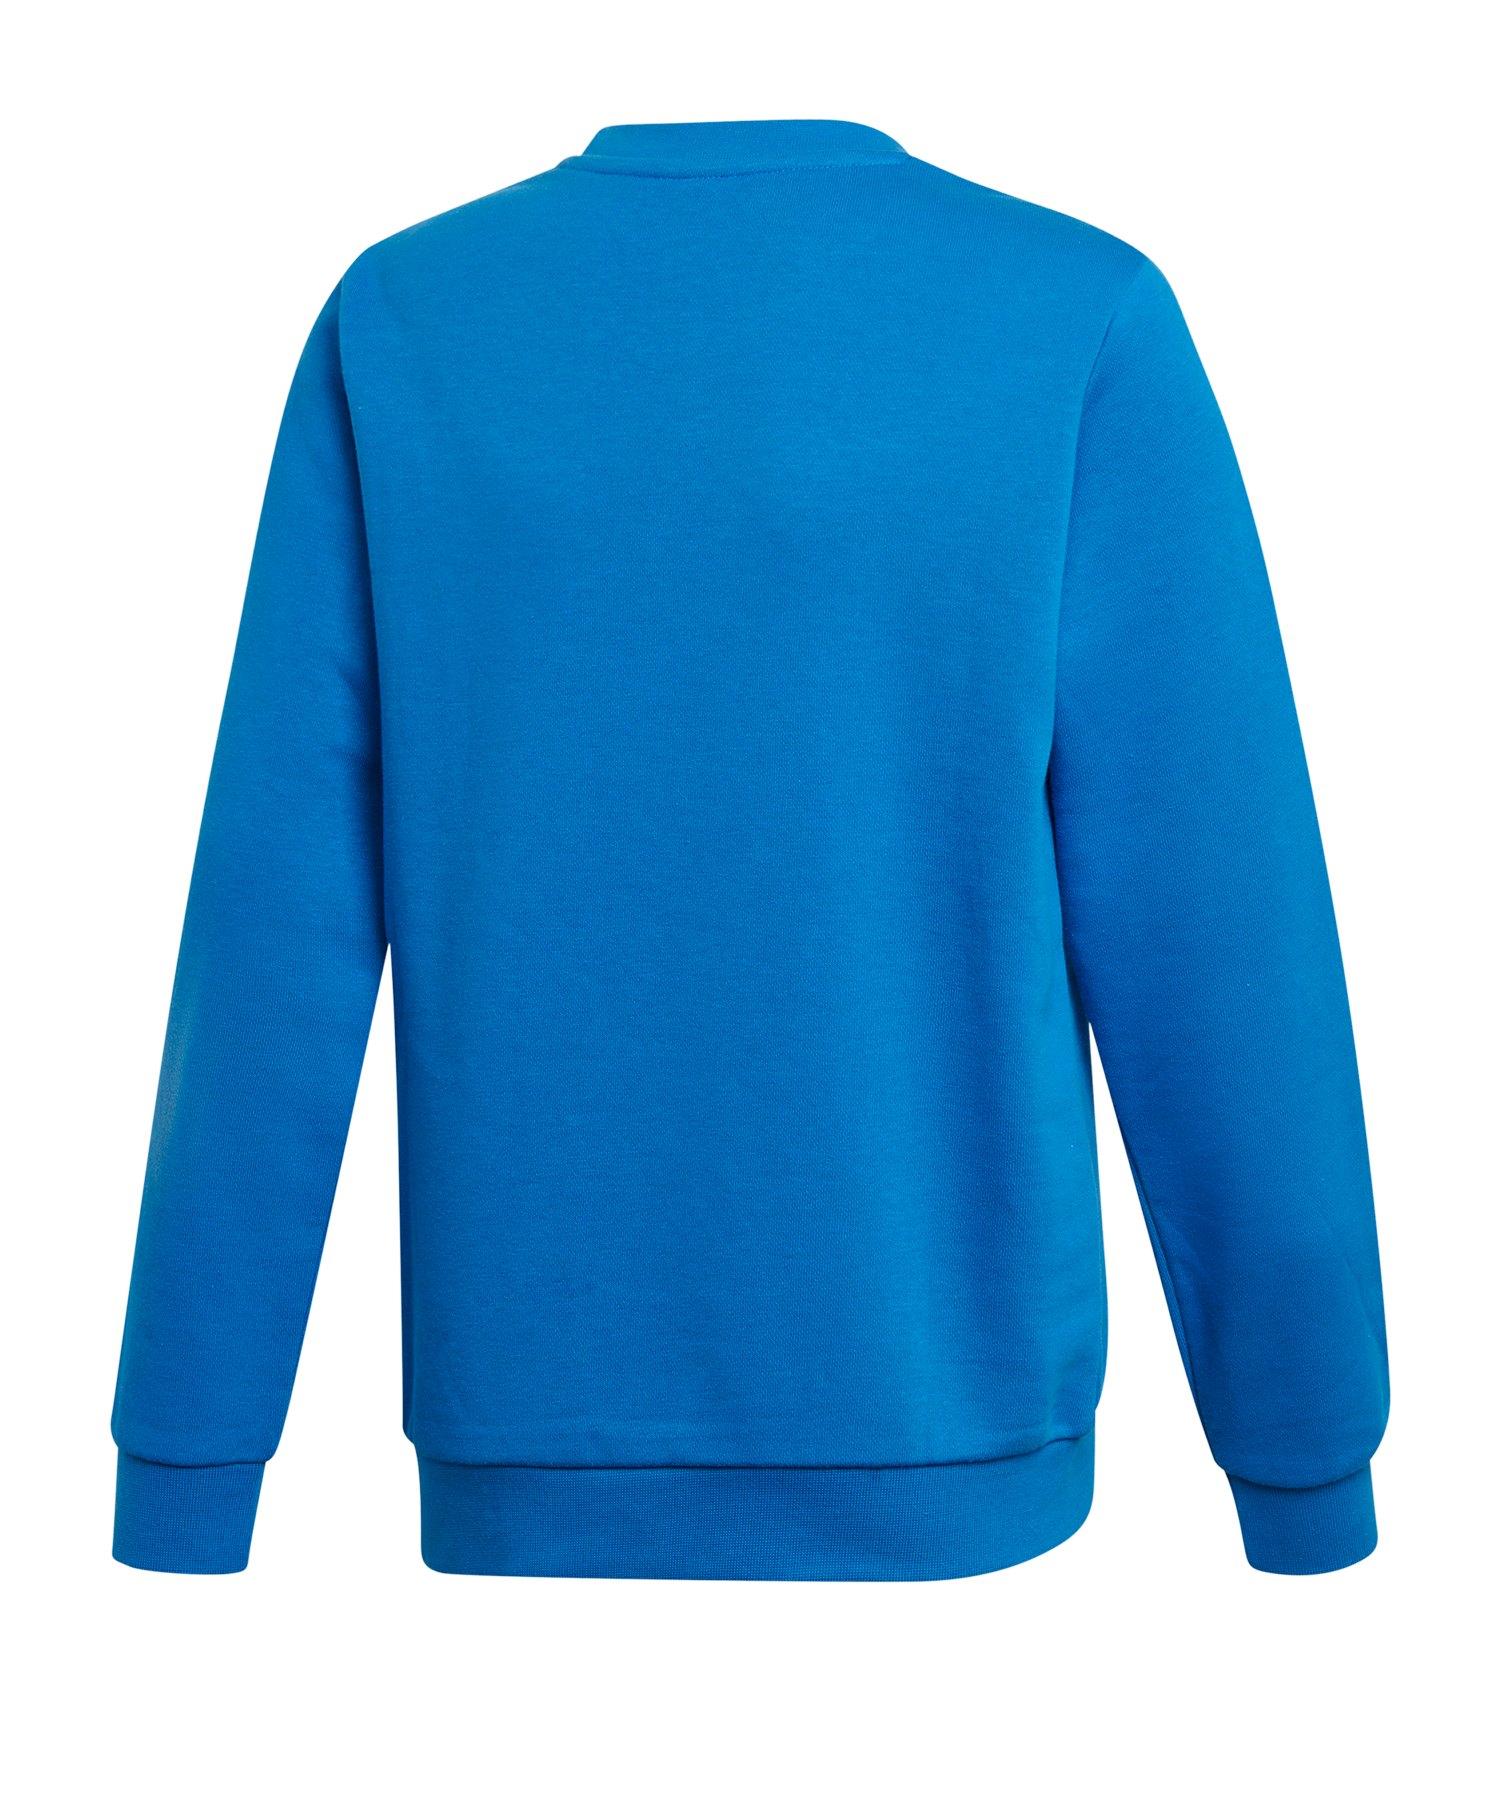 adidas Originals Trefoil Crew Sweatshirt Kids Blau